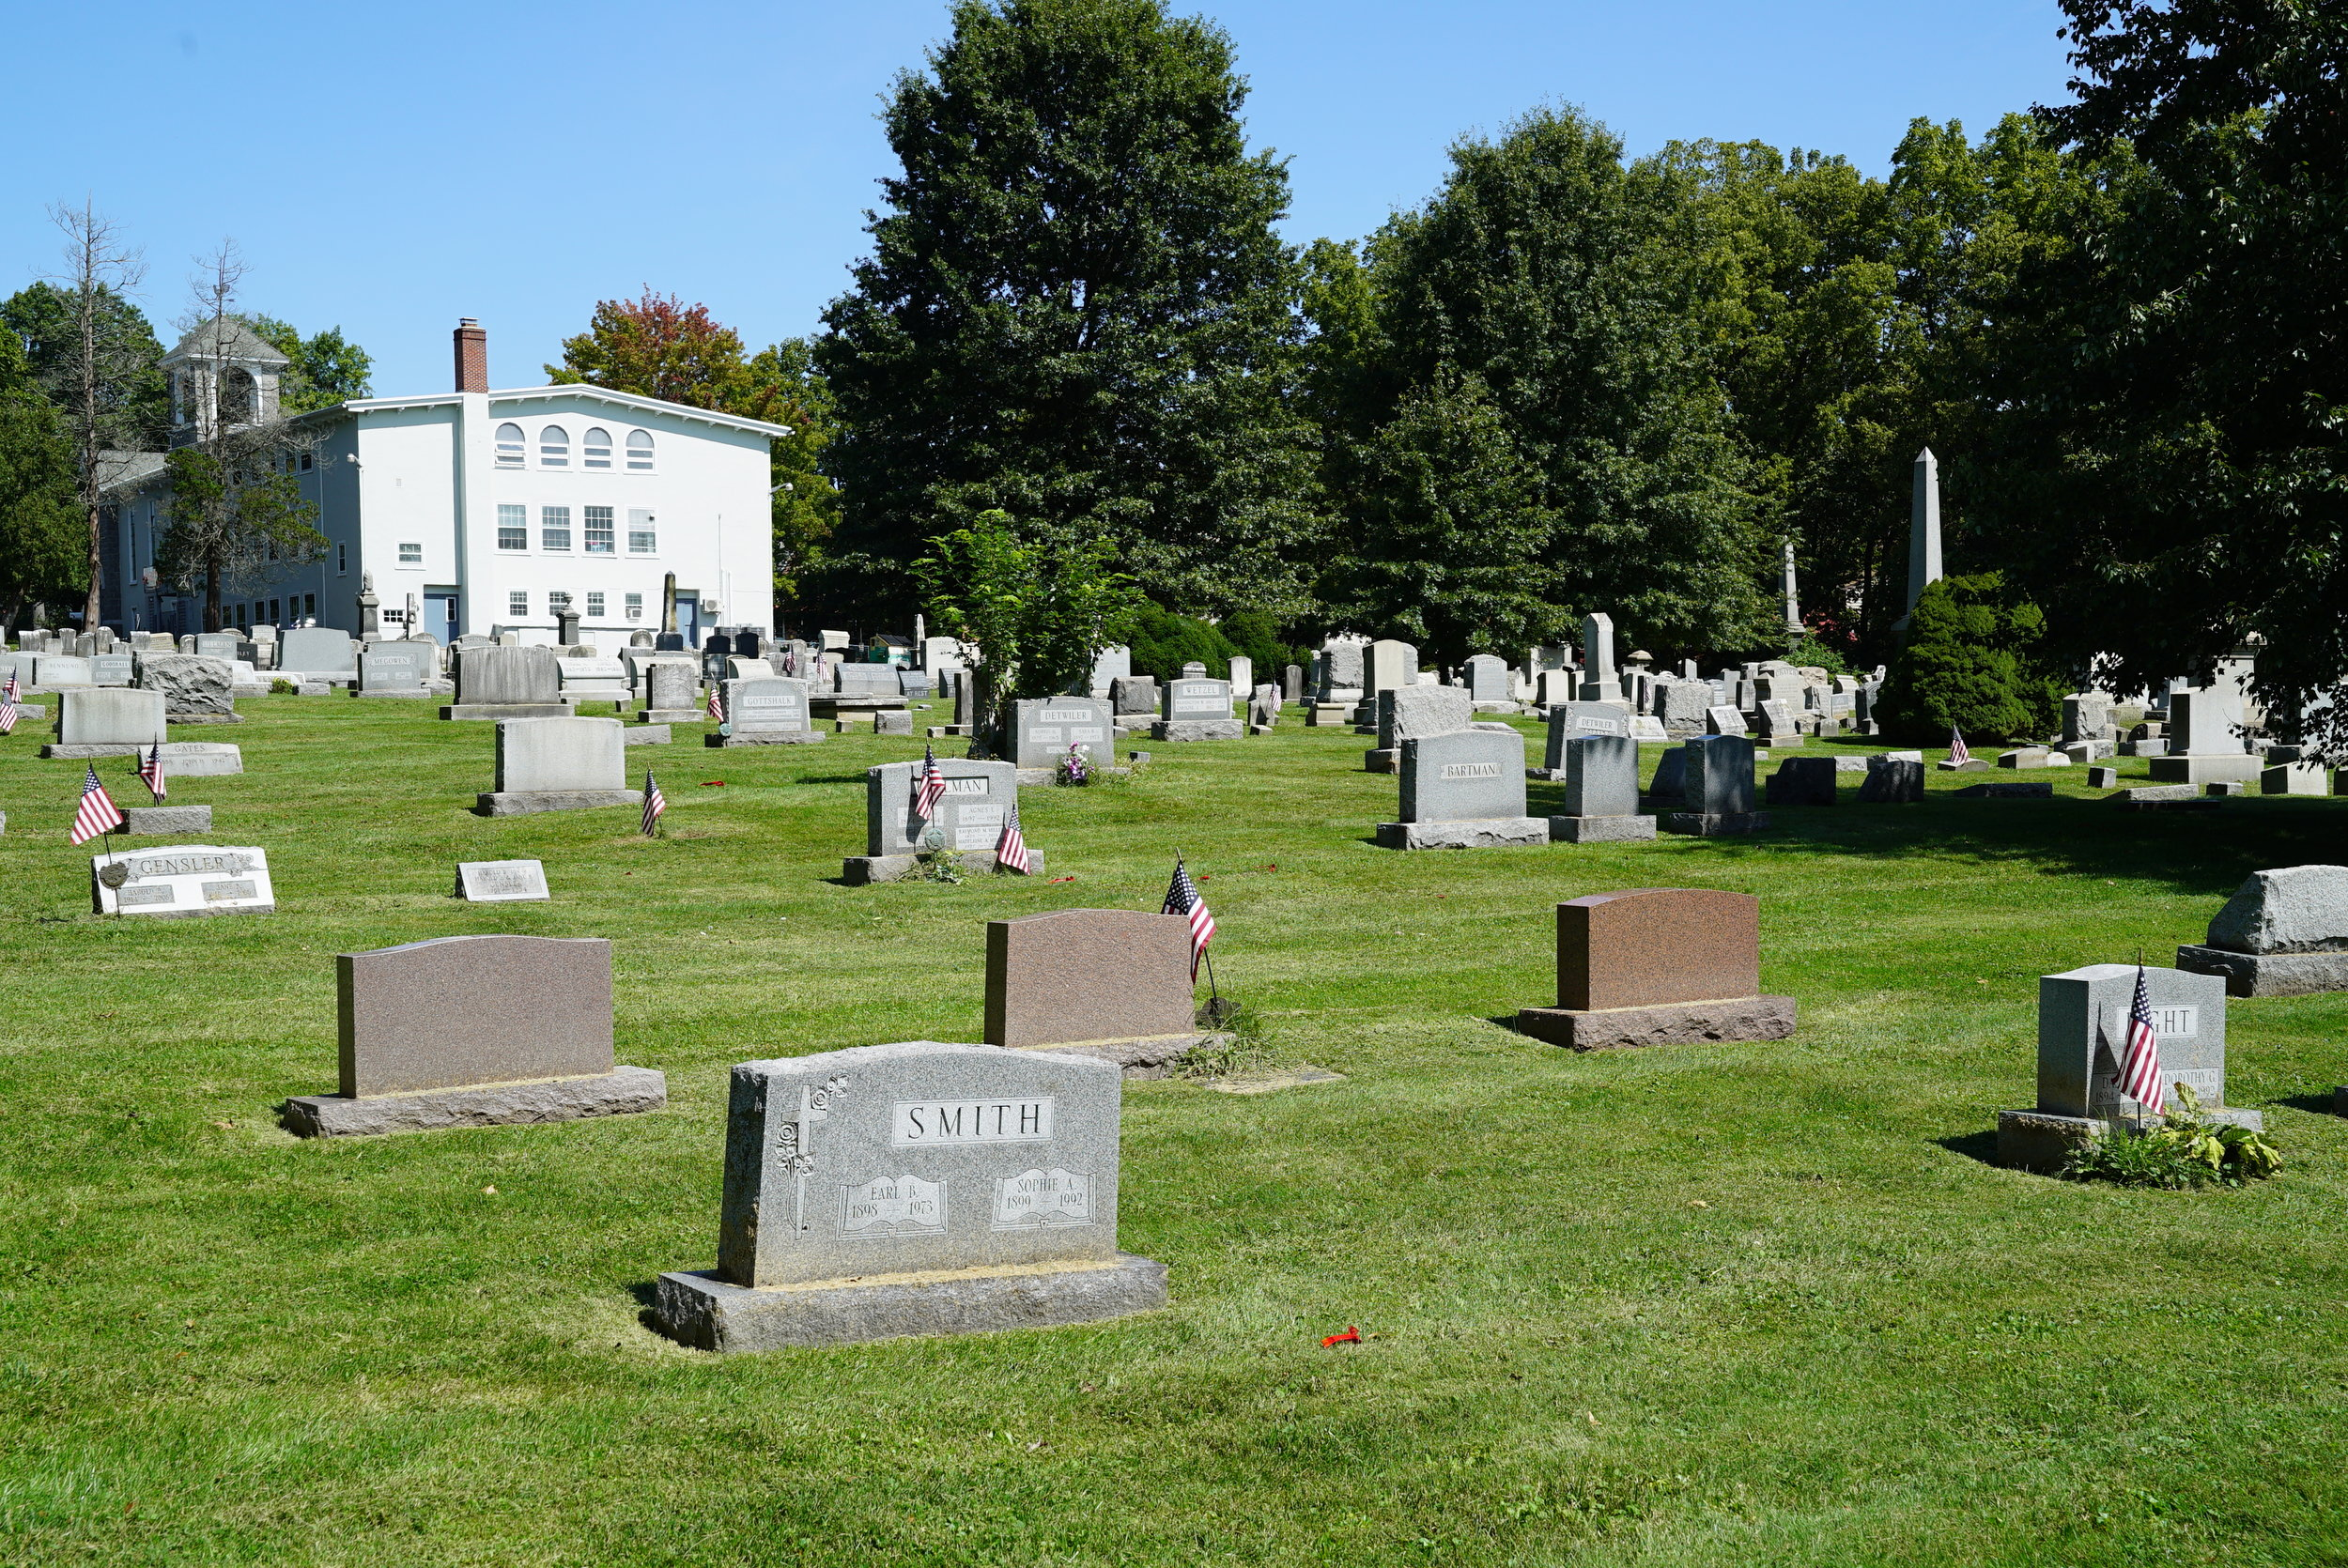 Trinity Reformed United Church of Christ Cemetery. Collegeville, Pennsylvania.